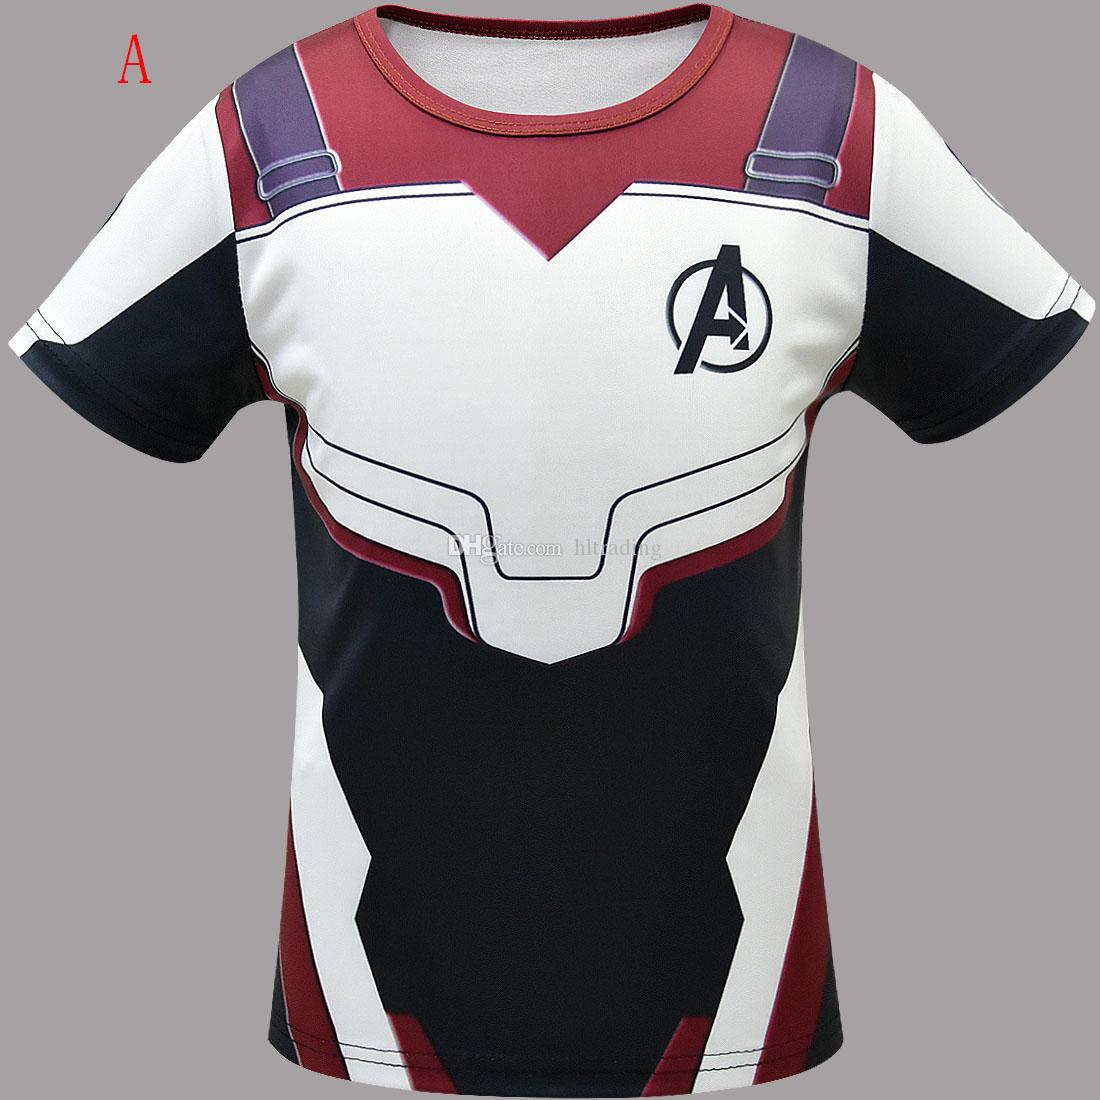 The Avengers 4 Endgame Superhero 3D Short Sleeve T-shirt Shirt Cosplay Tops Tee